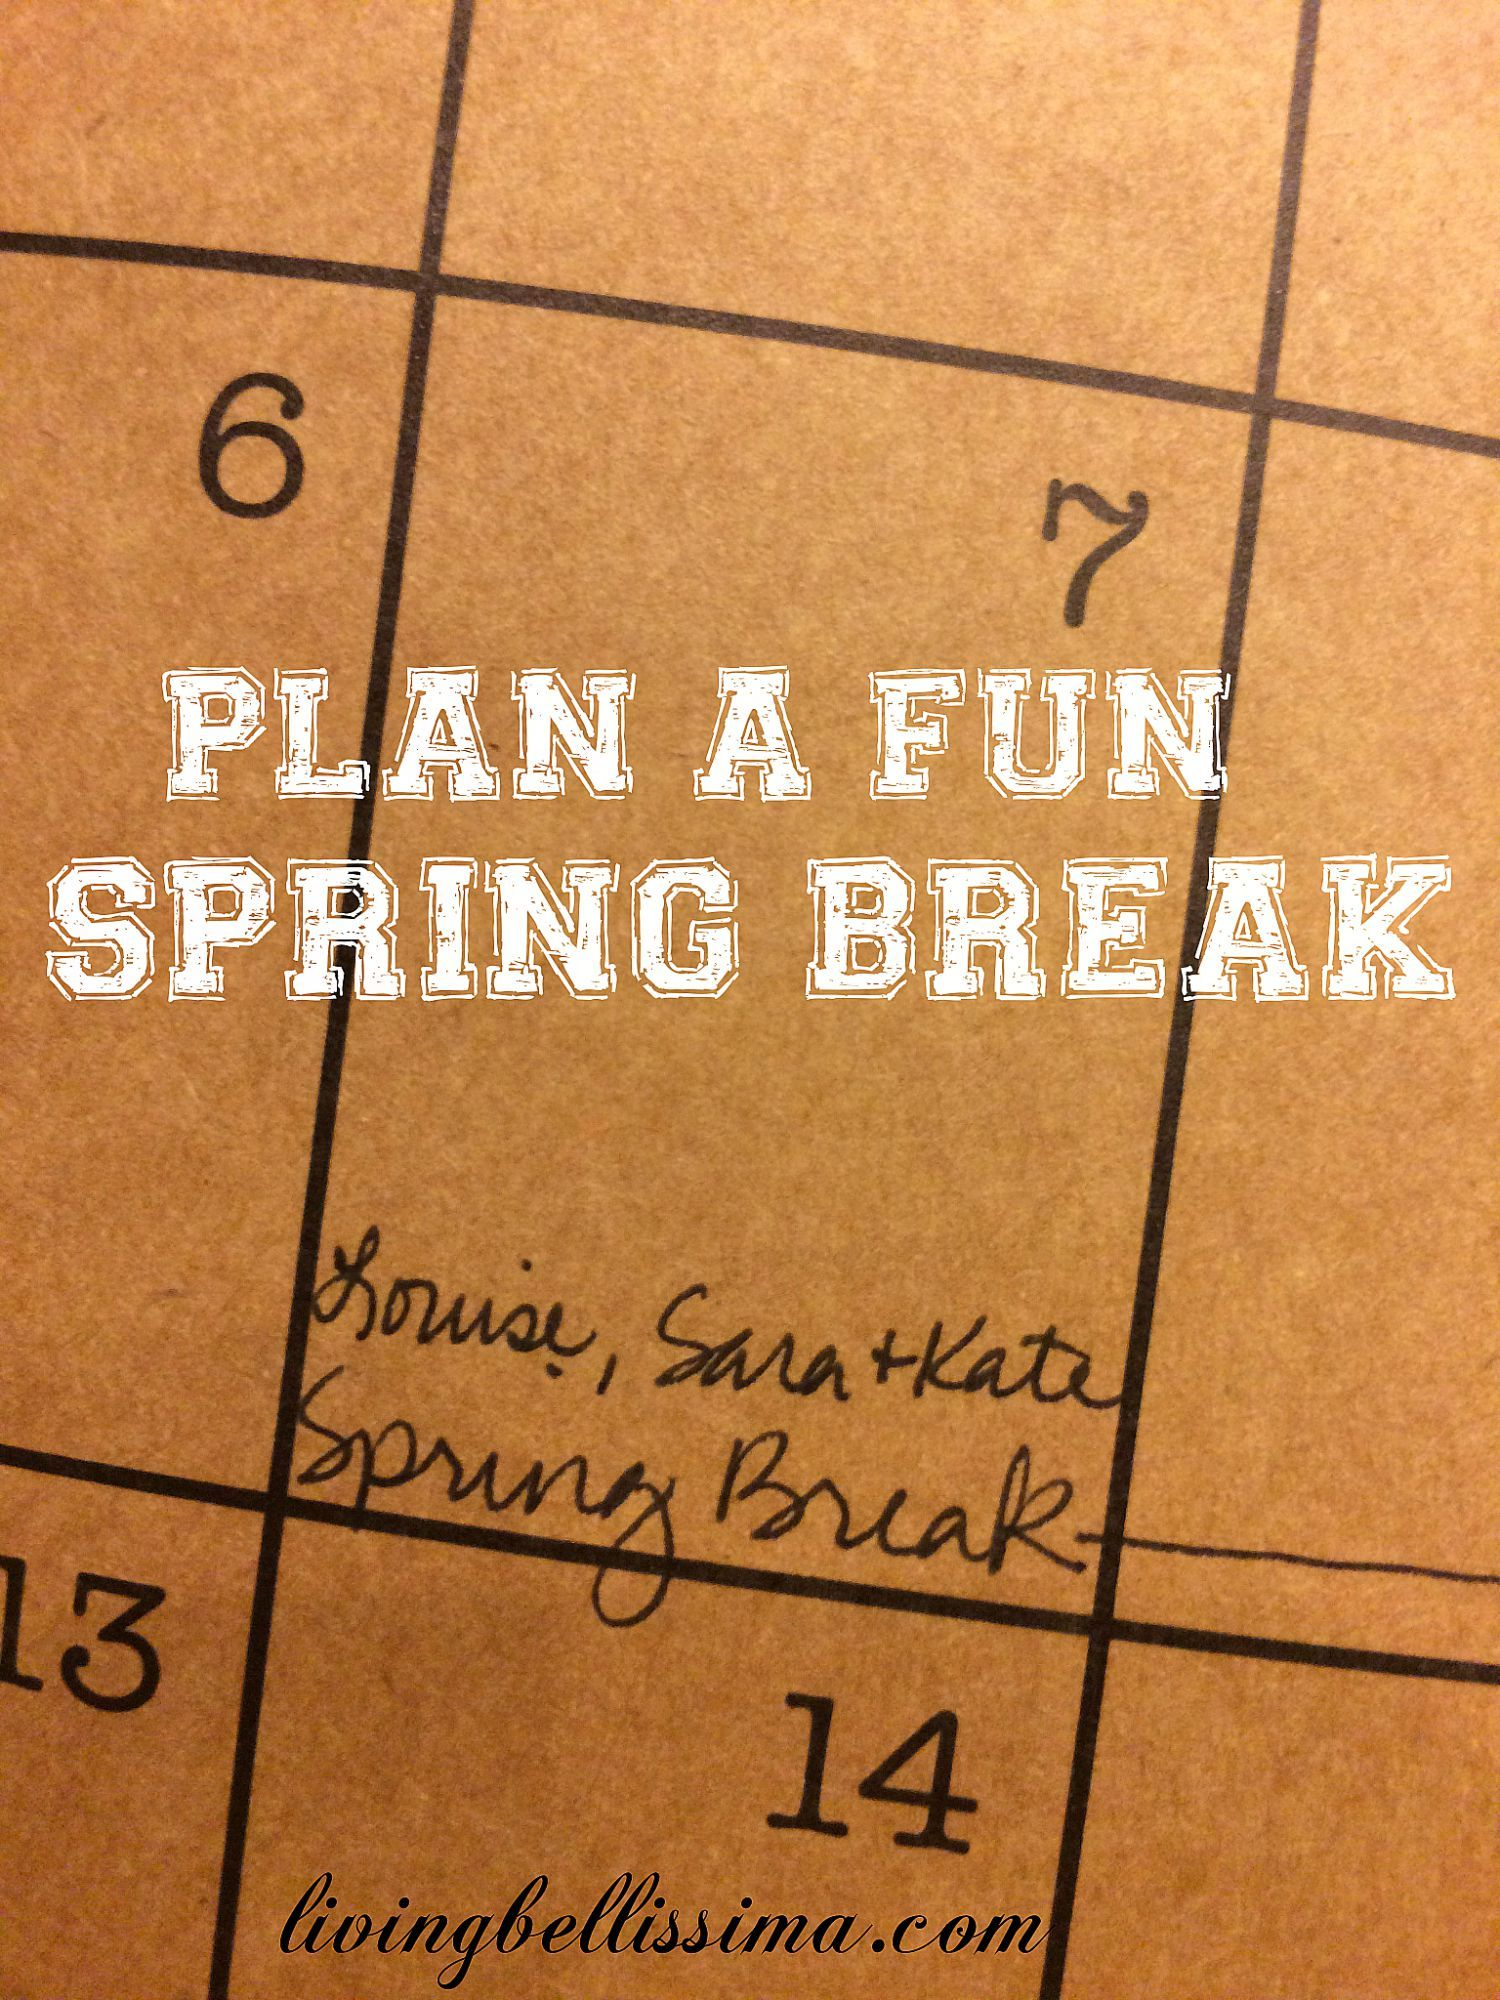 When spring break begins 19